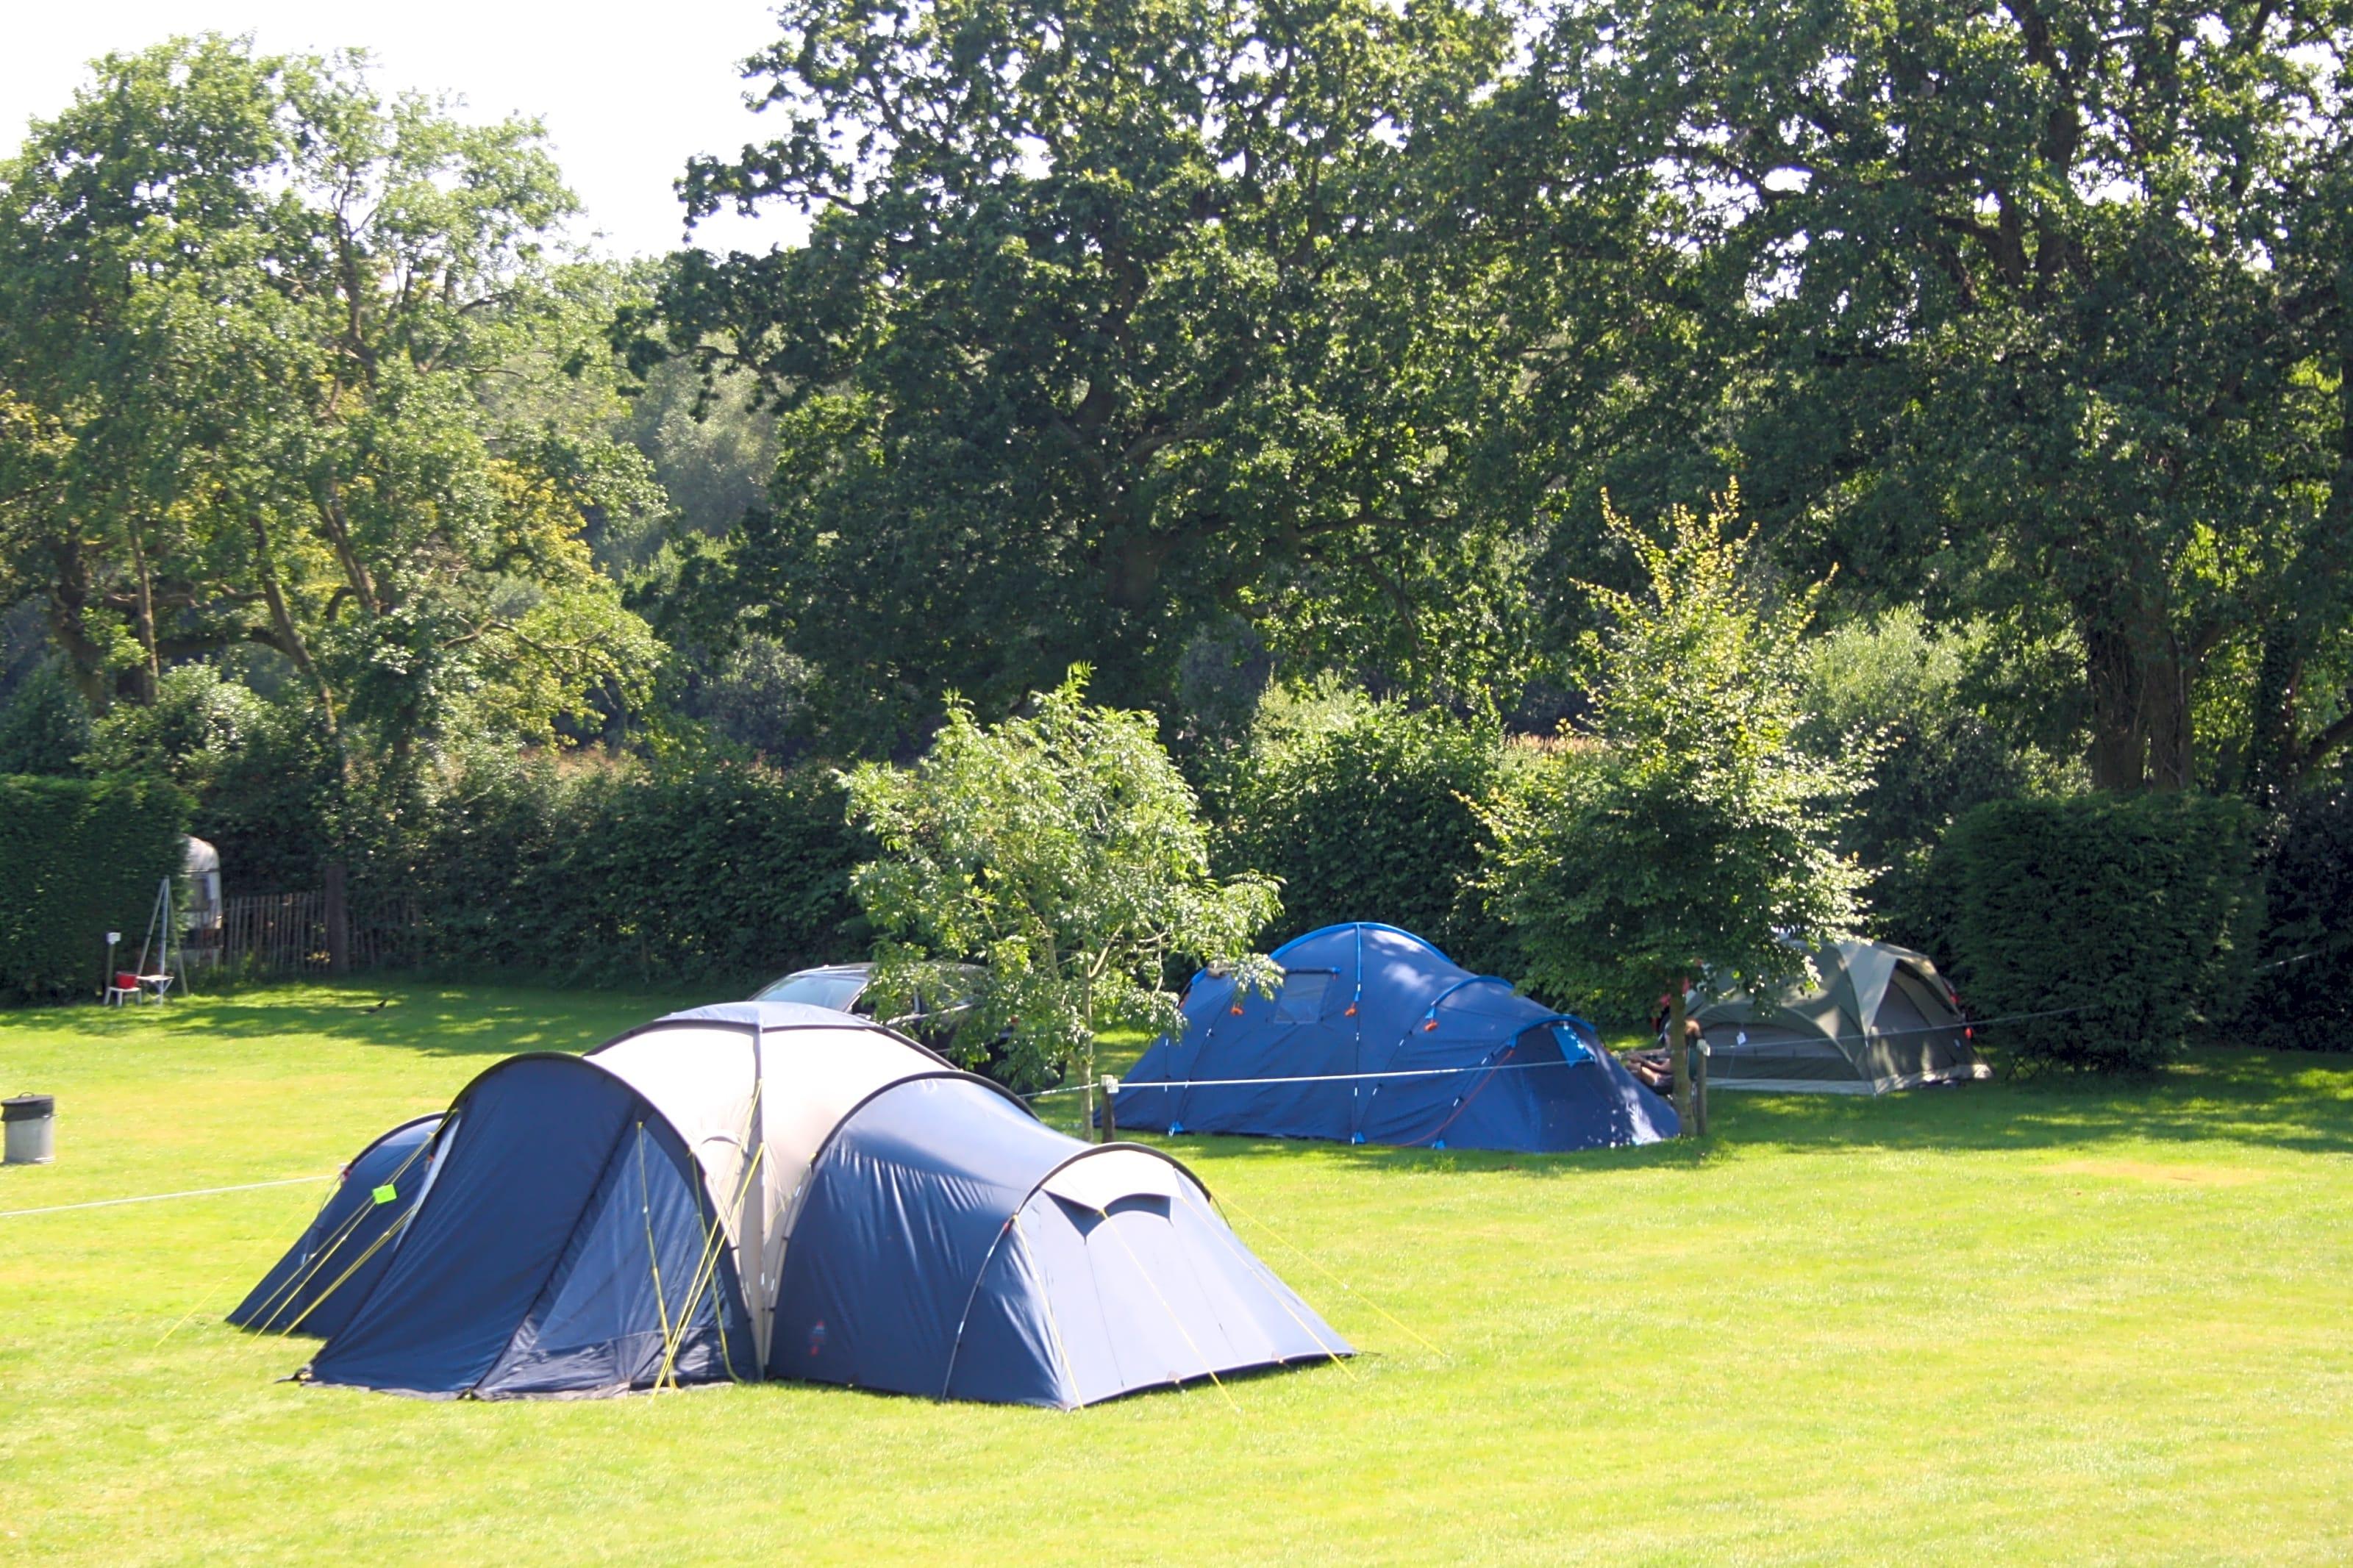 St Leonards Farm Caravan and Camping Park, Bournemouth